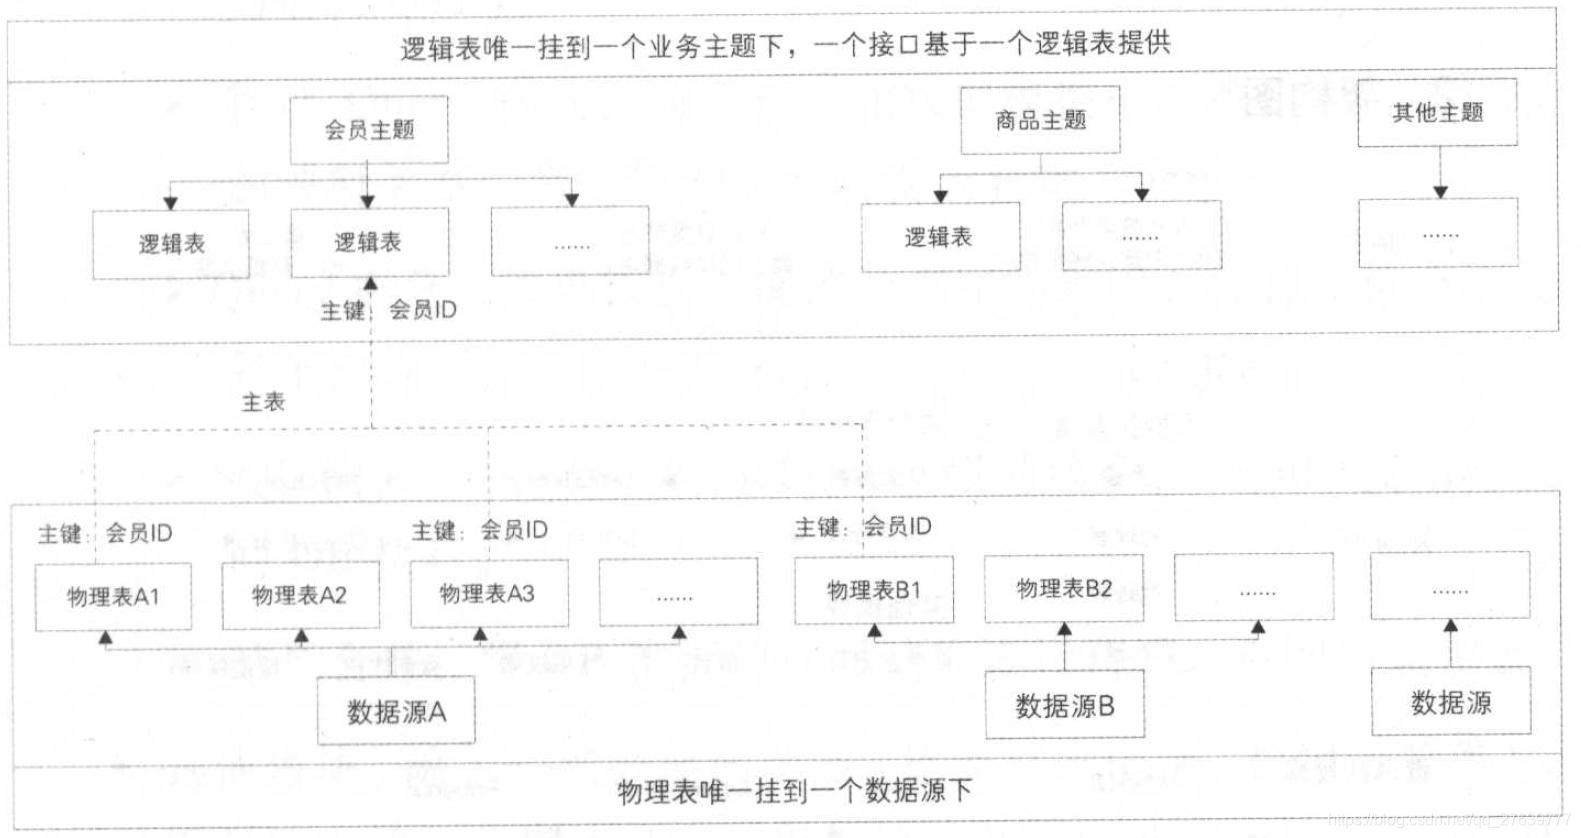 SmartDQ 的元数据模型架构示意图